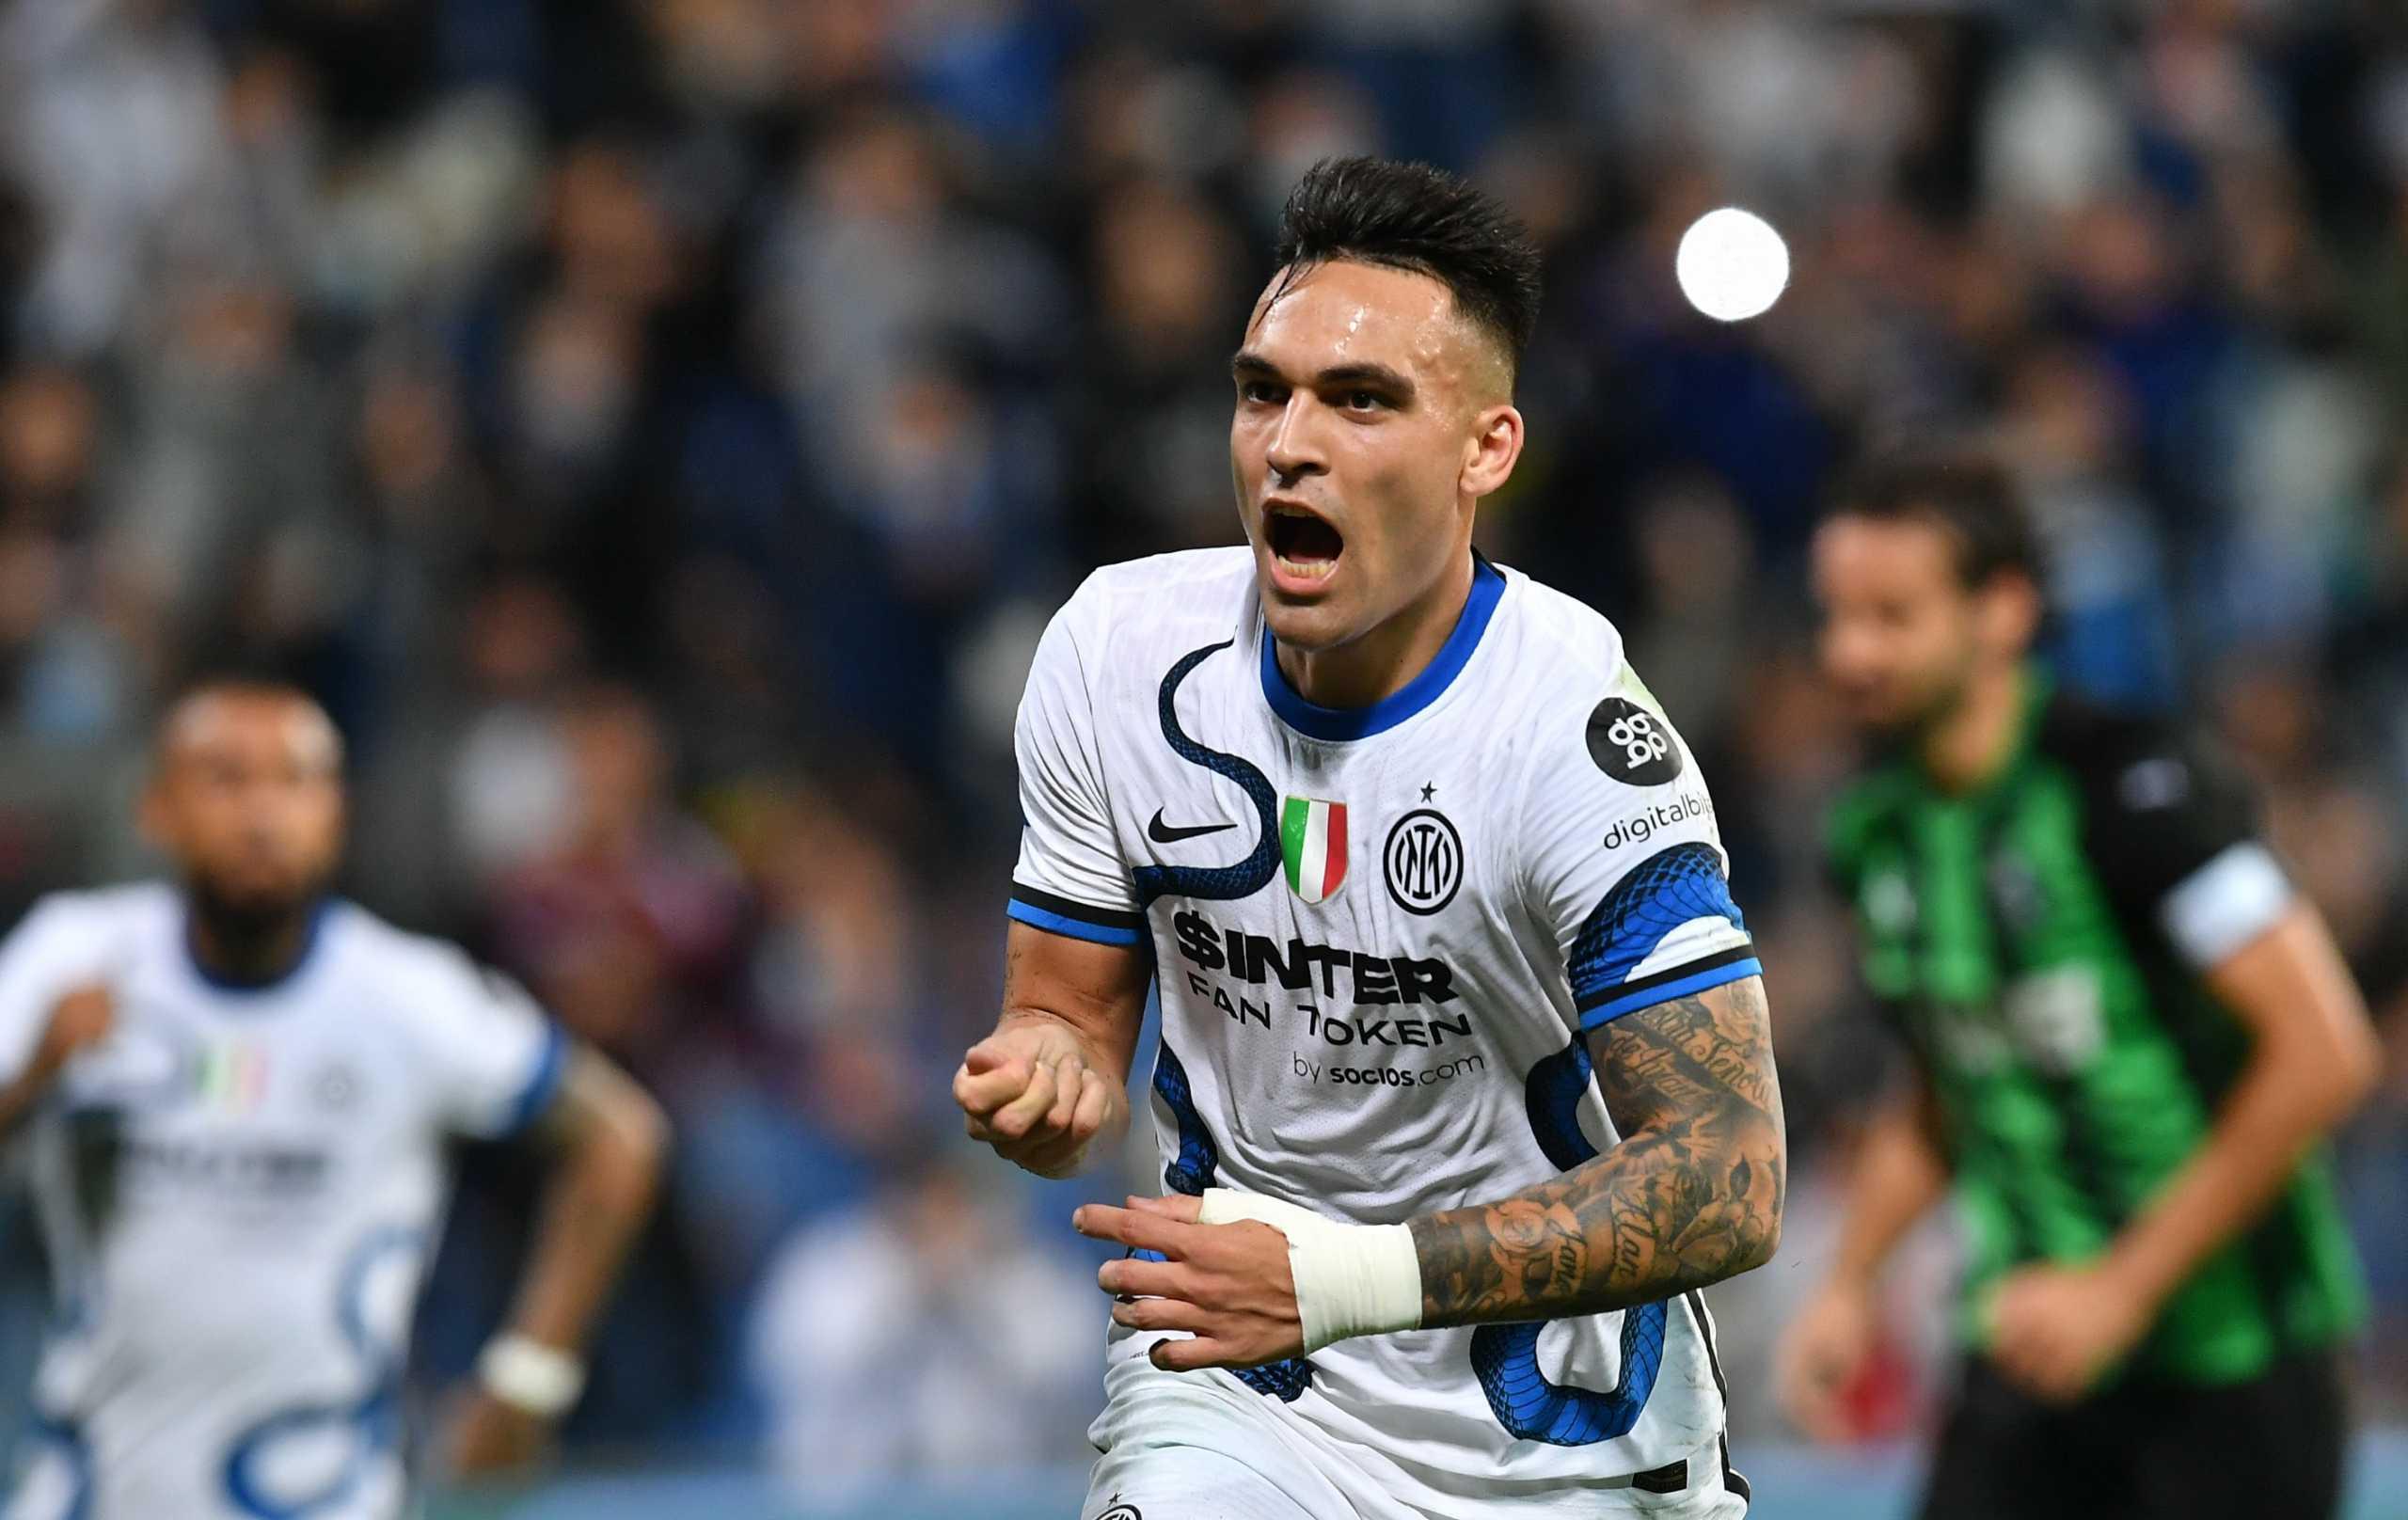 Serie A, Σασουόλο – Ίντερ 1-2: «Ψυχωμένη» ανατροπή και διπλό για τους «νερατζούρι»